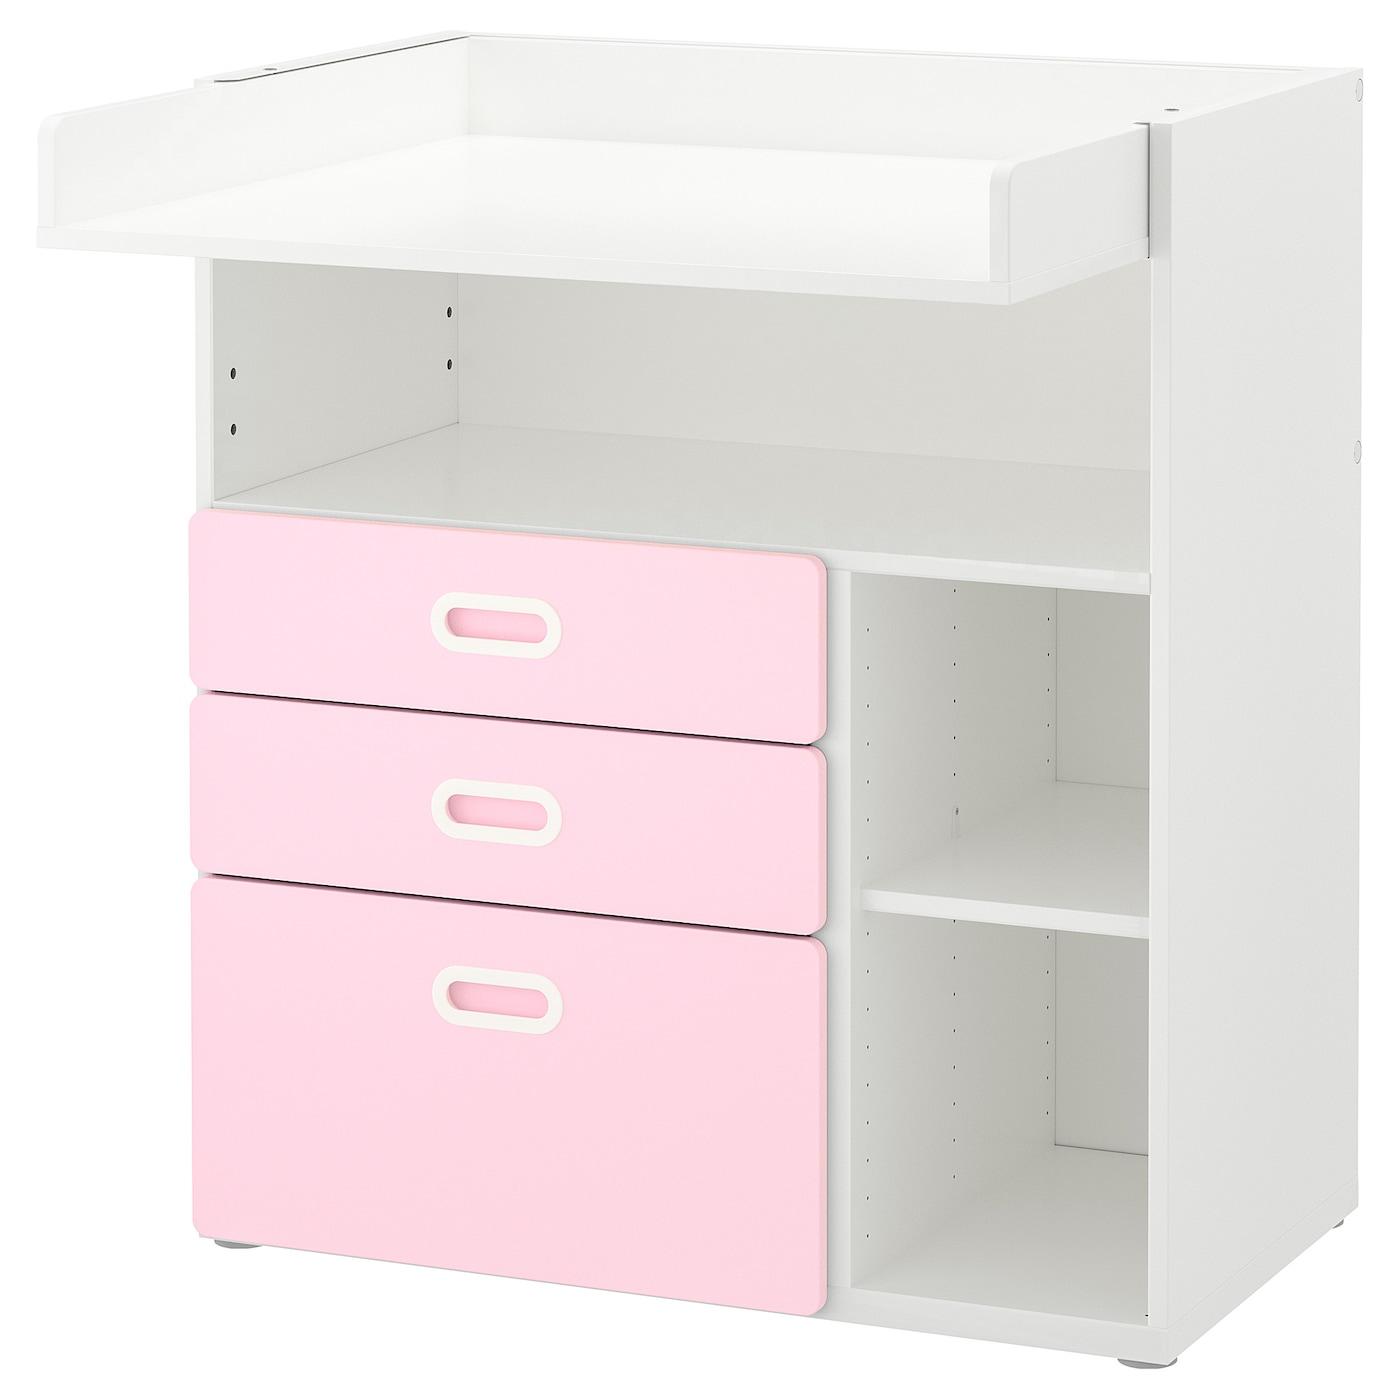 meubles b b mobilier chambre b b ikea. Black Bedroom Furniture Sets. Home Design Ideas